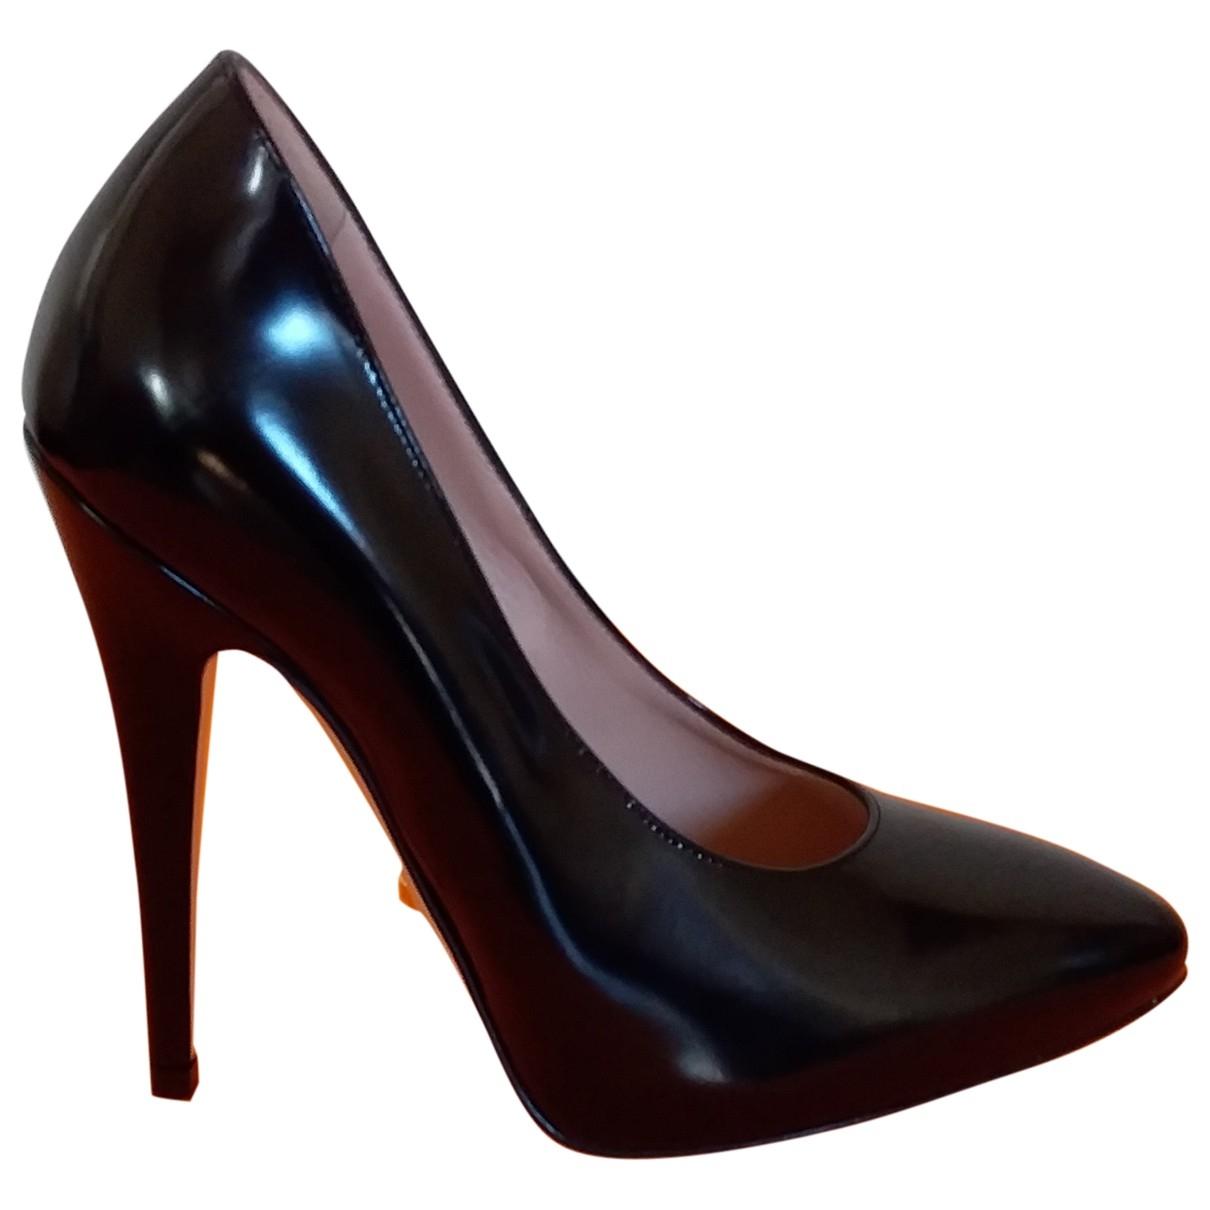 Gucci \N Black Leather Heels for Women 34.5 EU